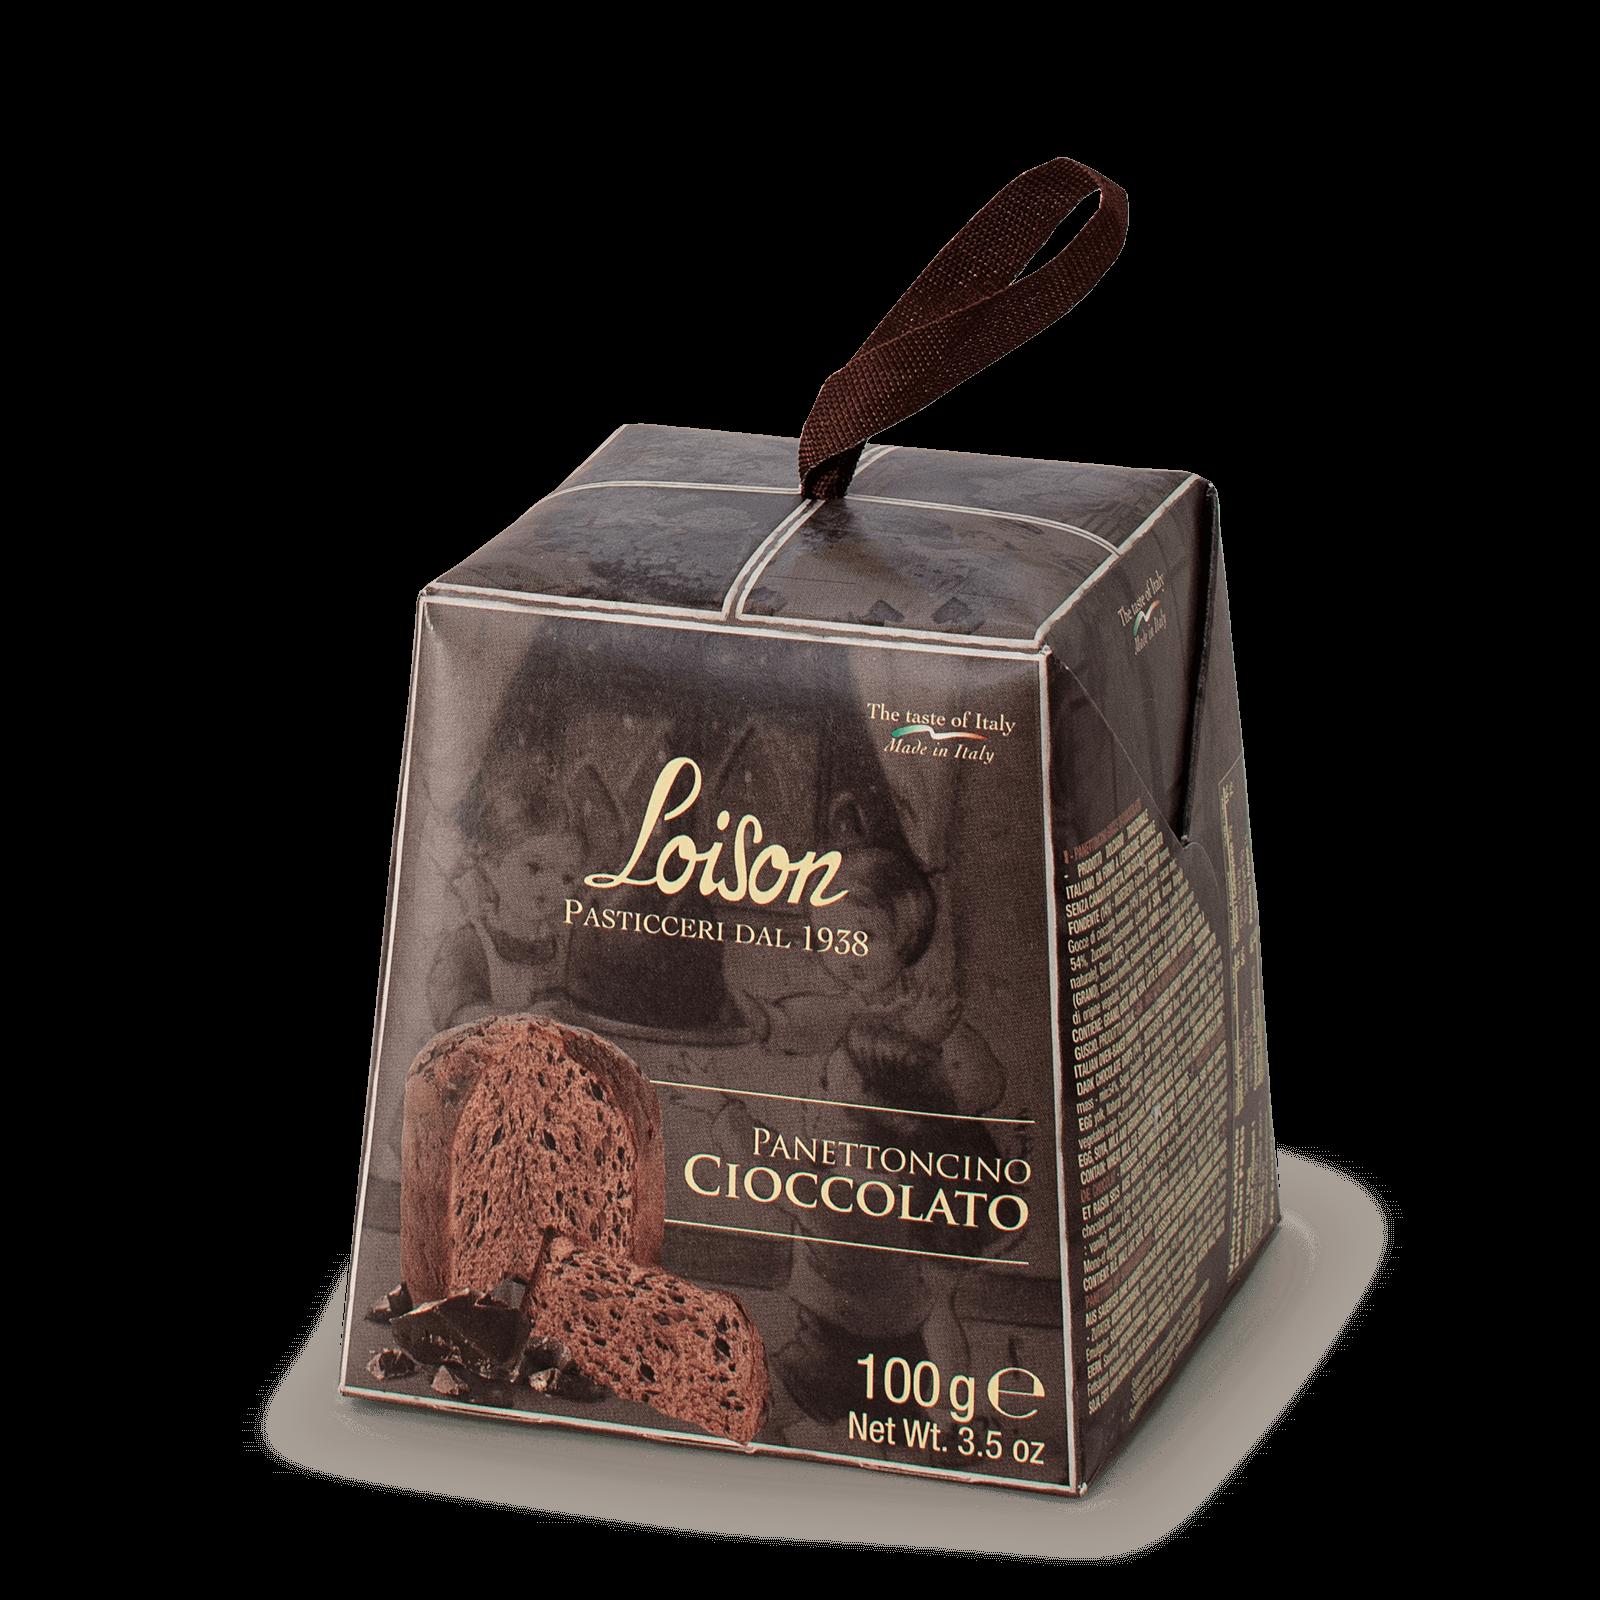 Panettoncino Cioccolato Mignon Loison